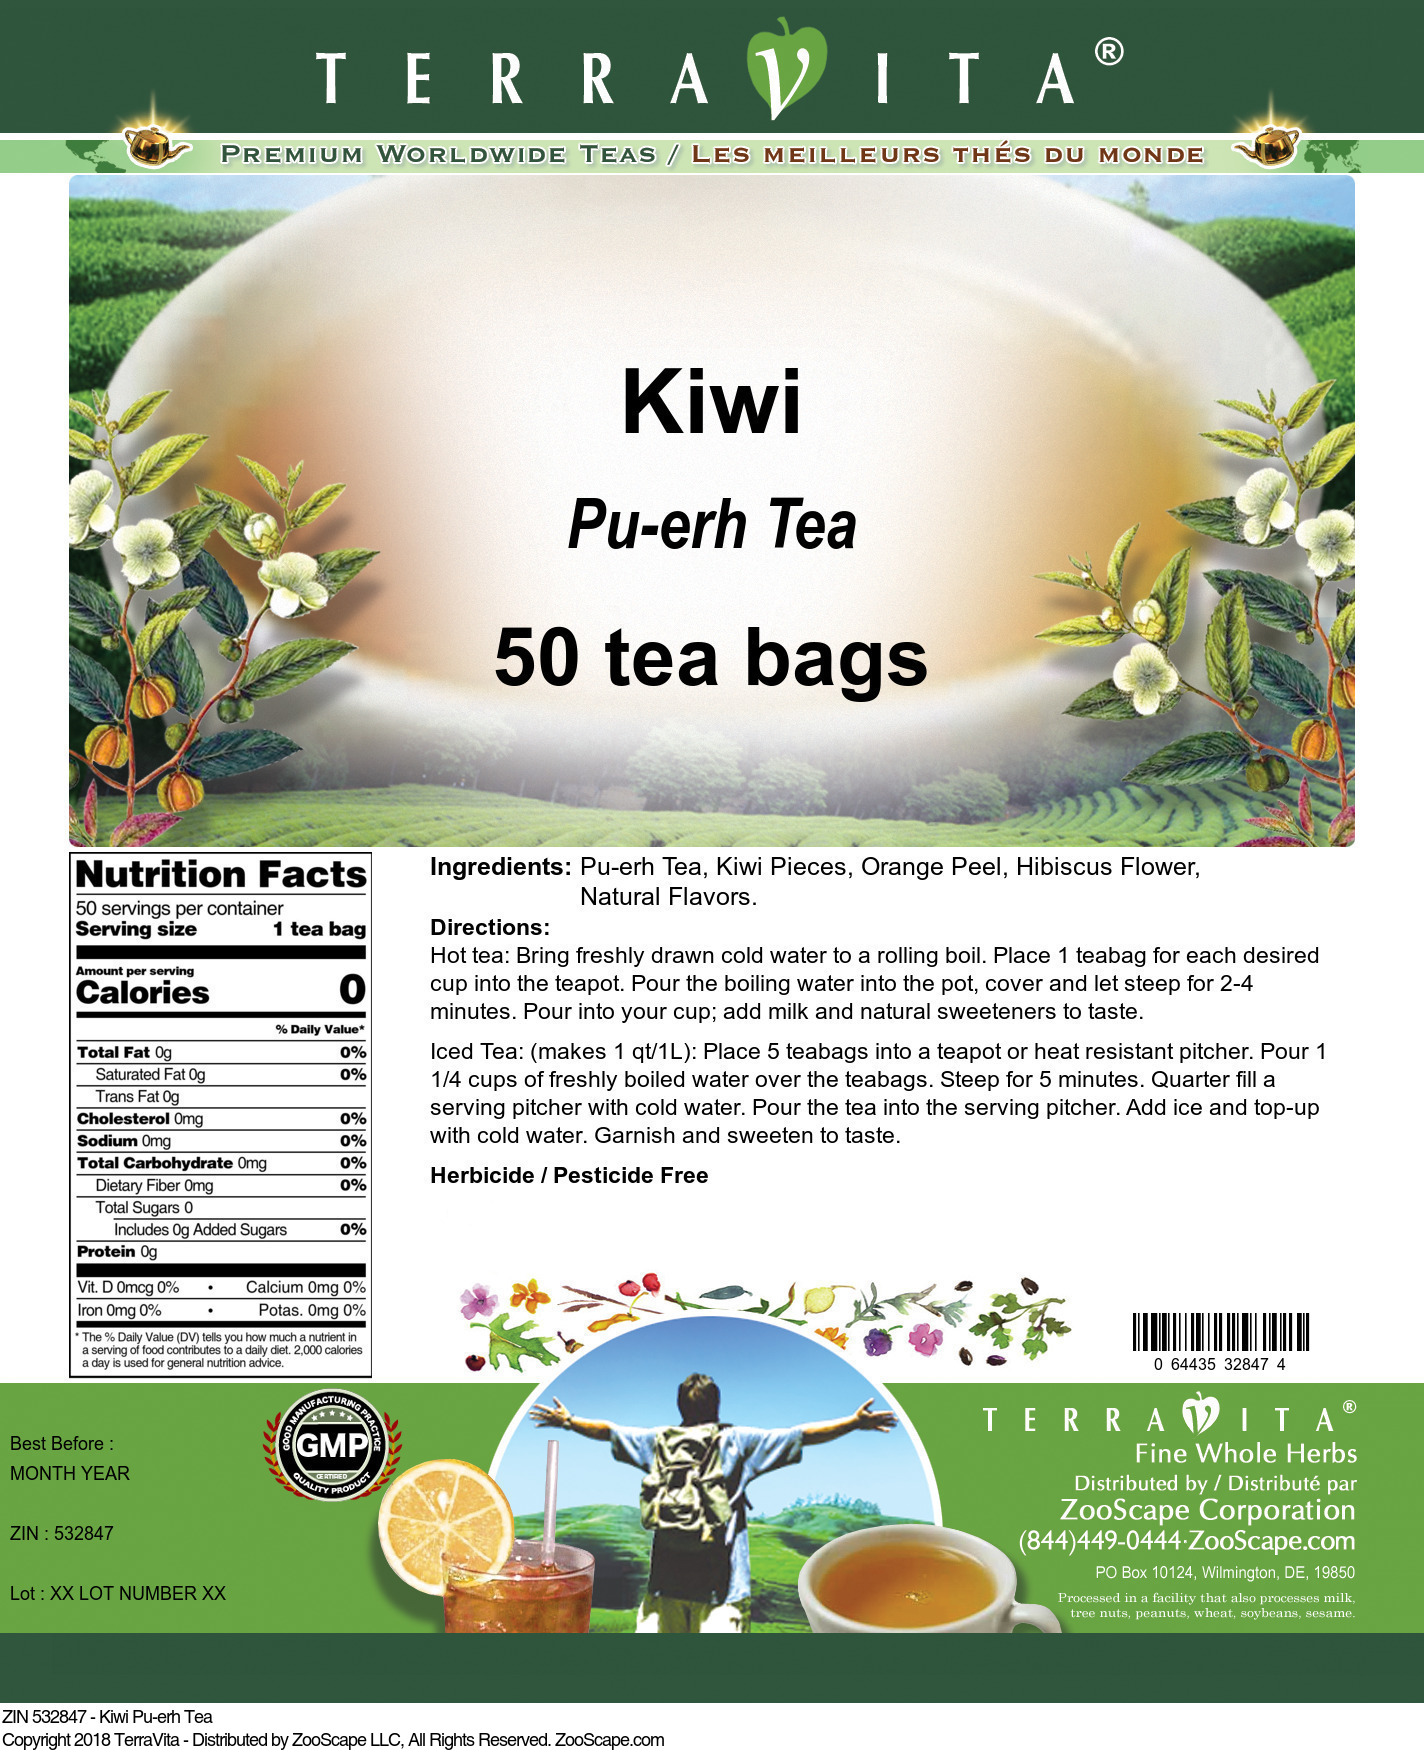 Kiwi Pu-erh Tea